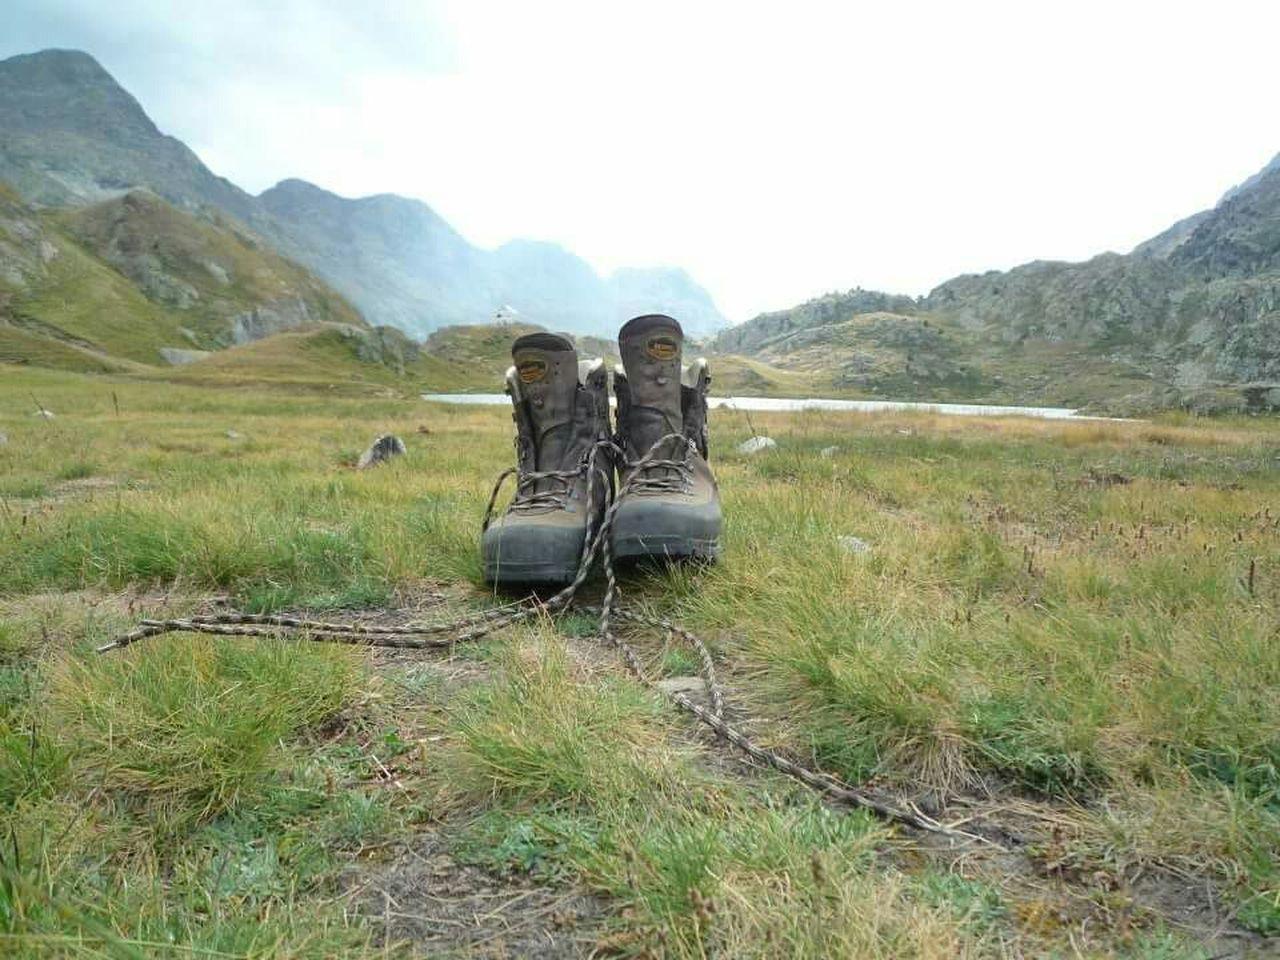 Mountain Shoes Pyrenees No Edit/no Filter Moi Mes Souliers Randonnée Trekking